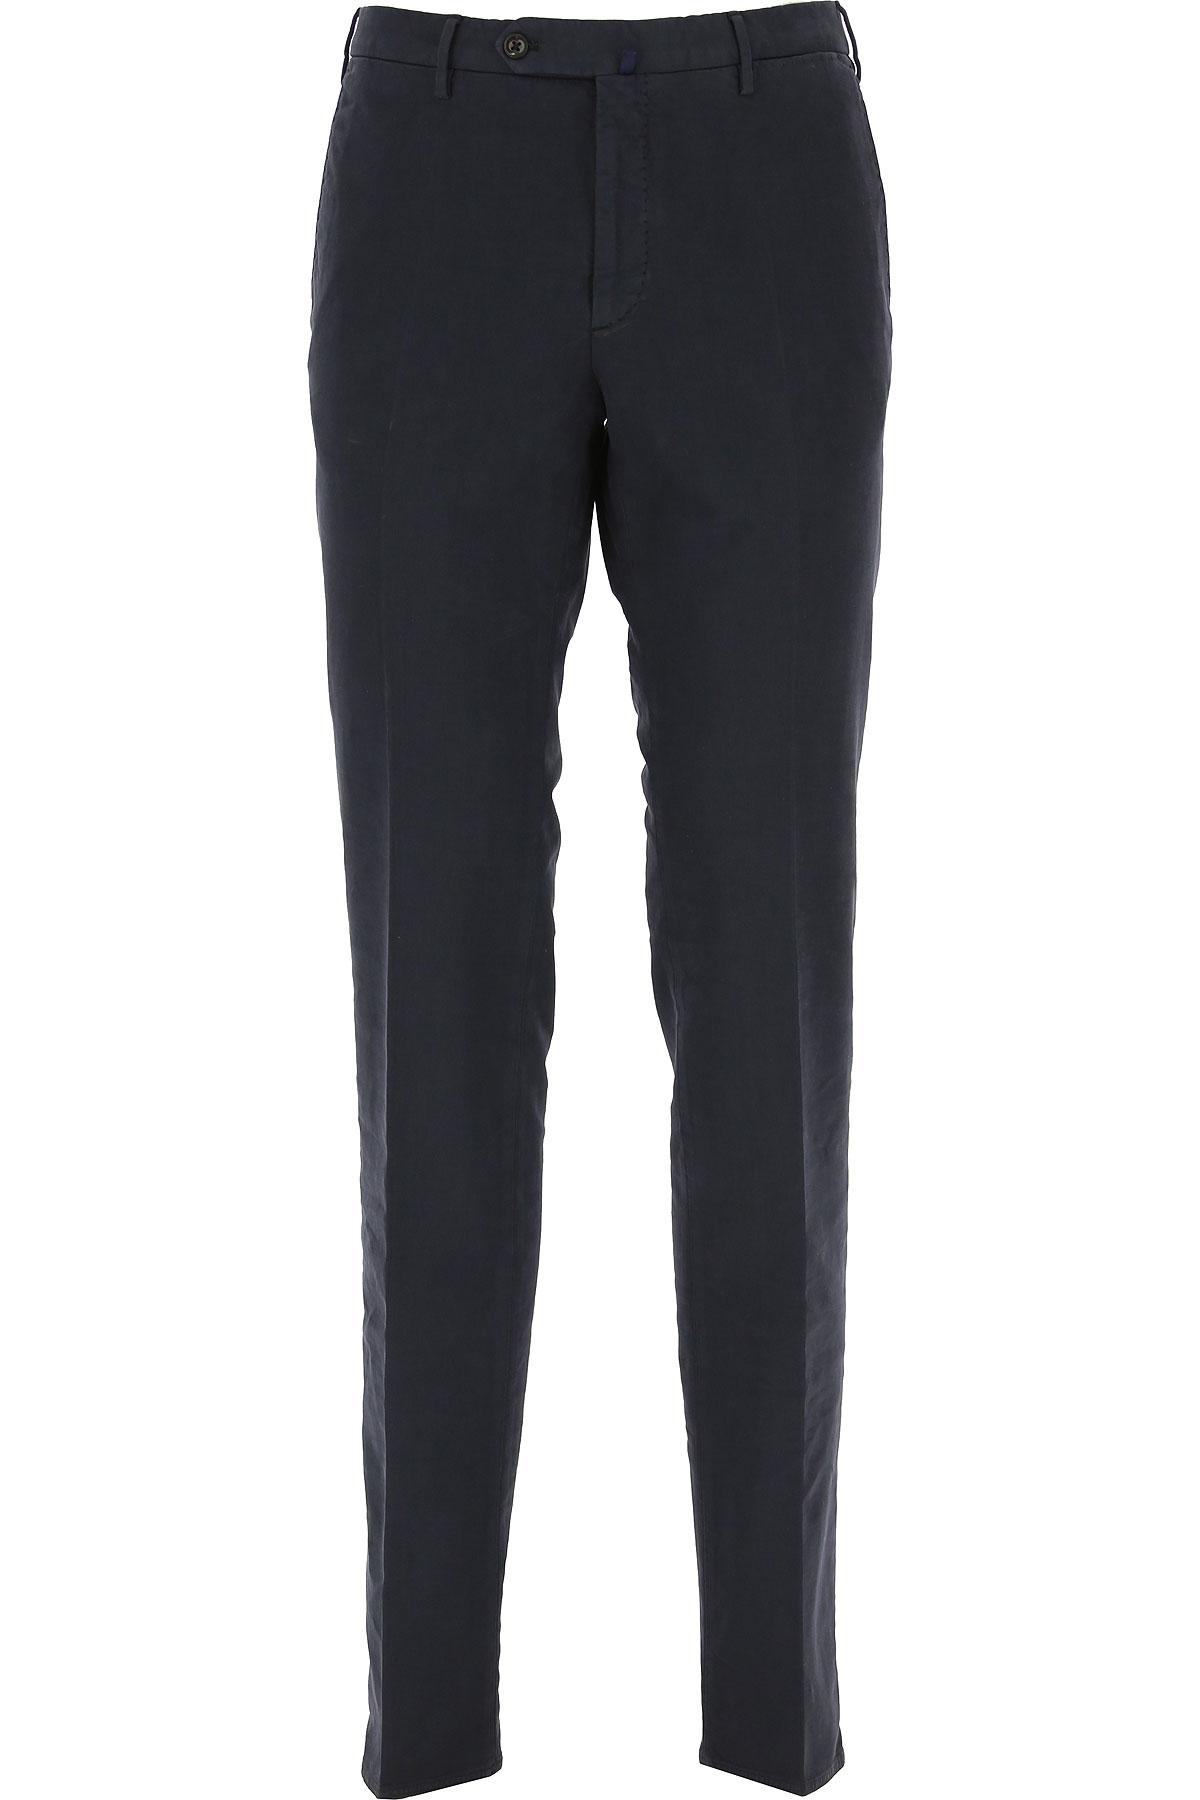 Incotex Pants for Men On Sale, Dark Midnight Blue, Cotton, 2019, 36 38 40